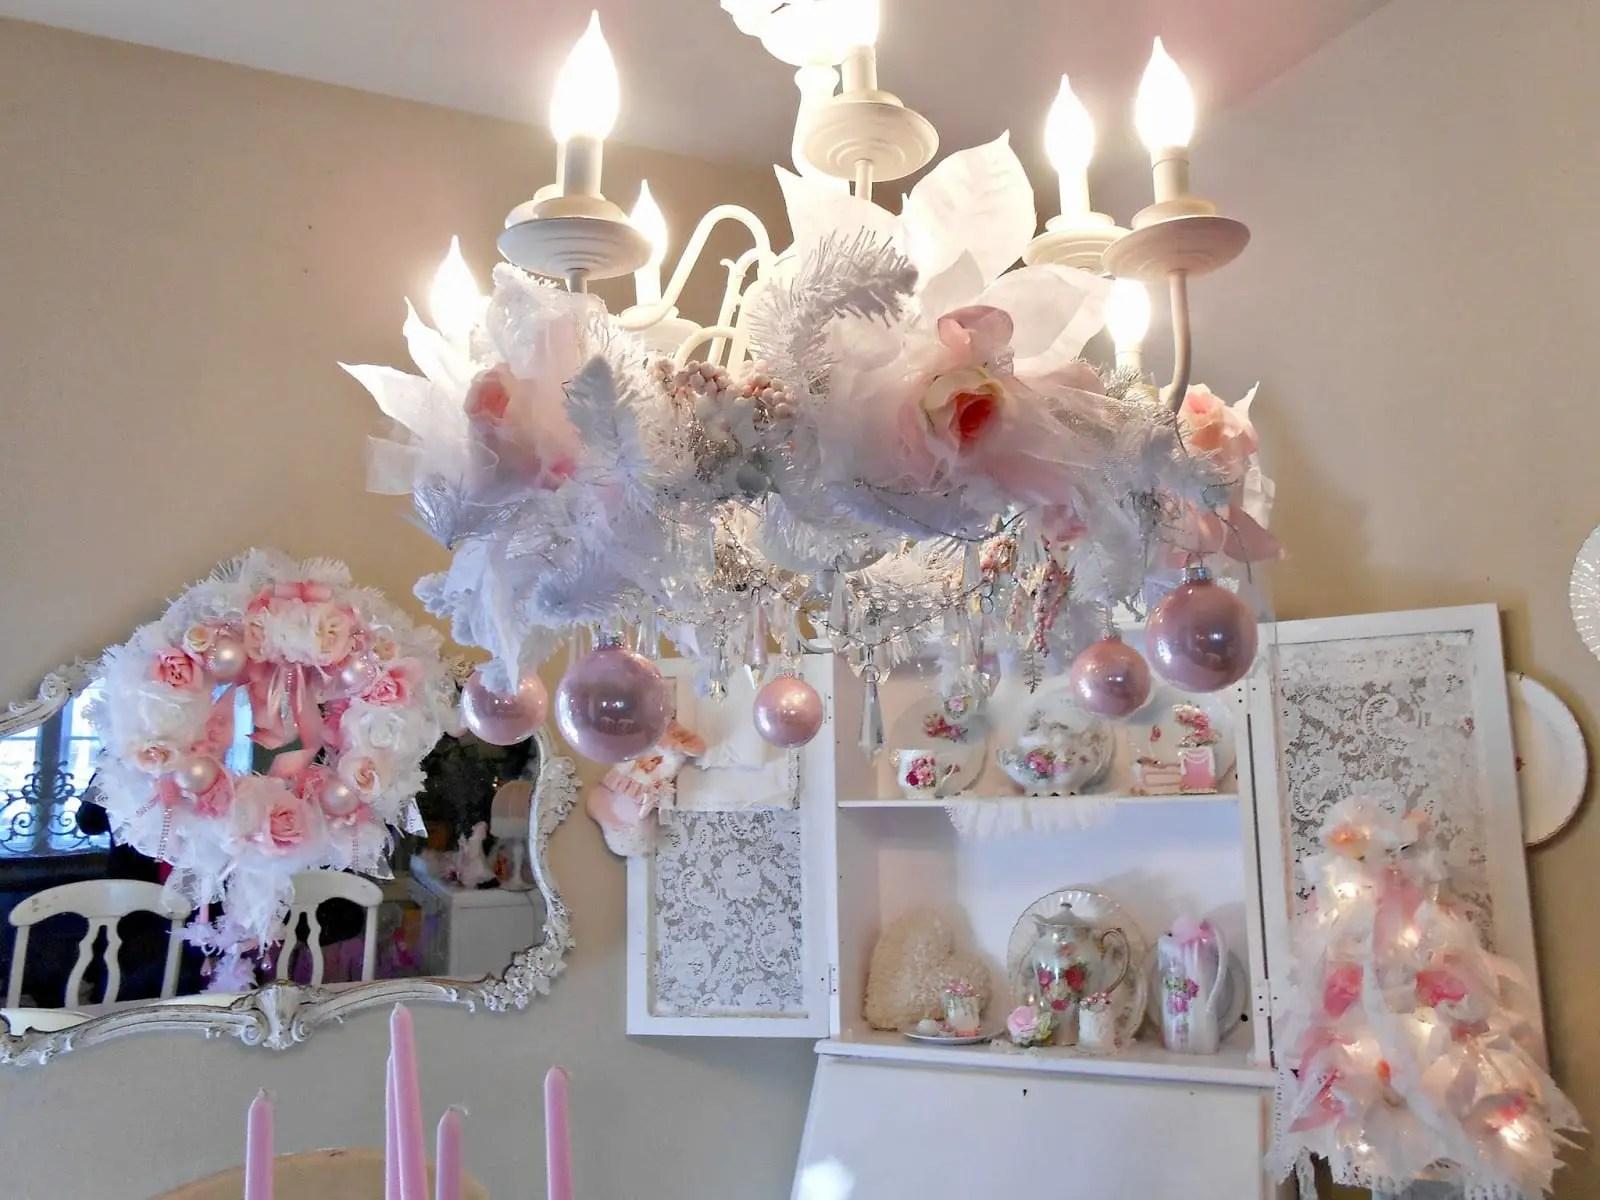 Decoración navideña en rosa - Dale Detalles